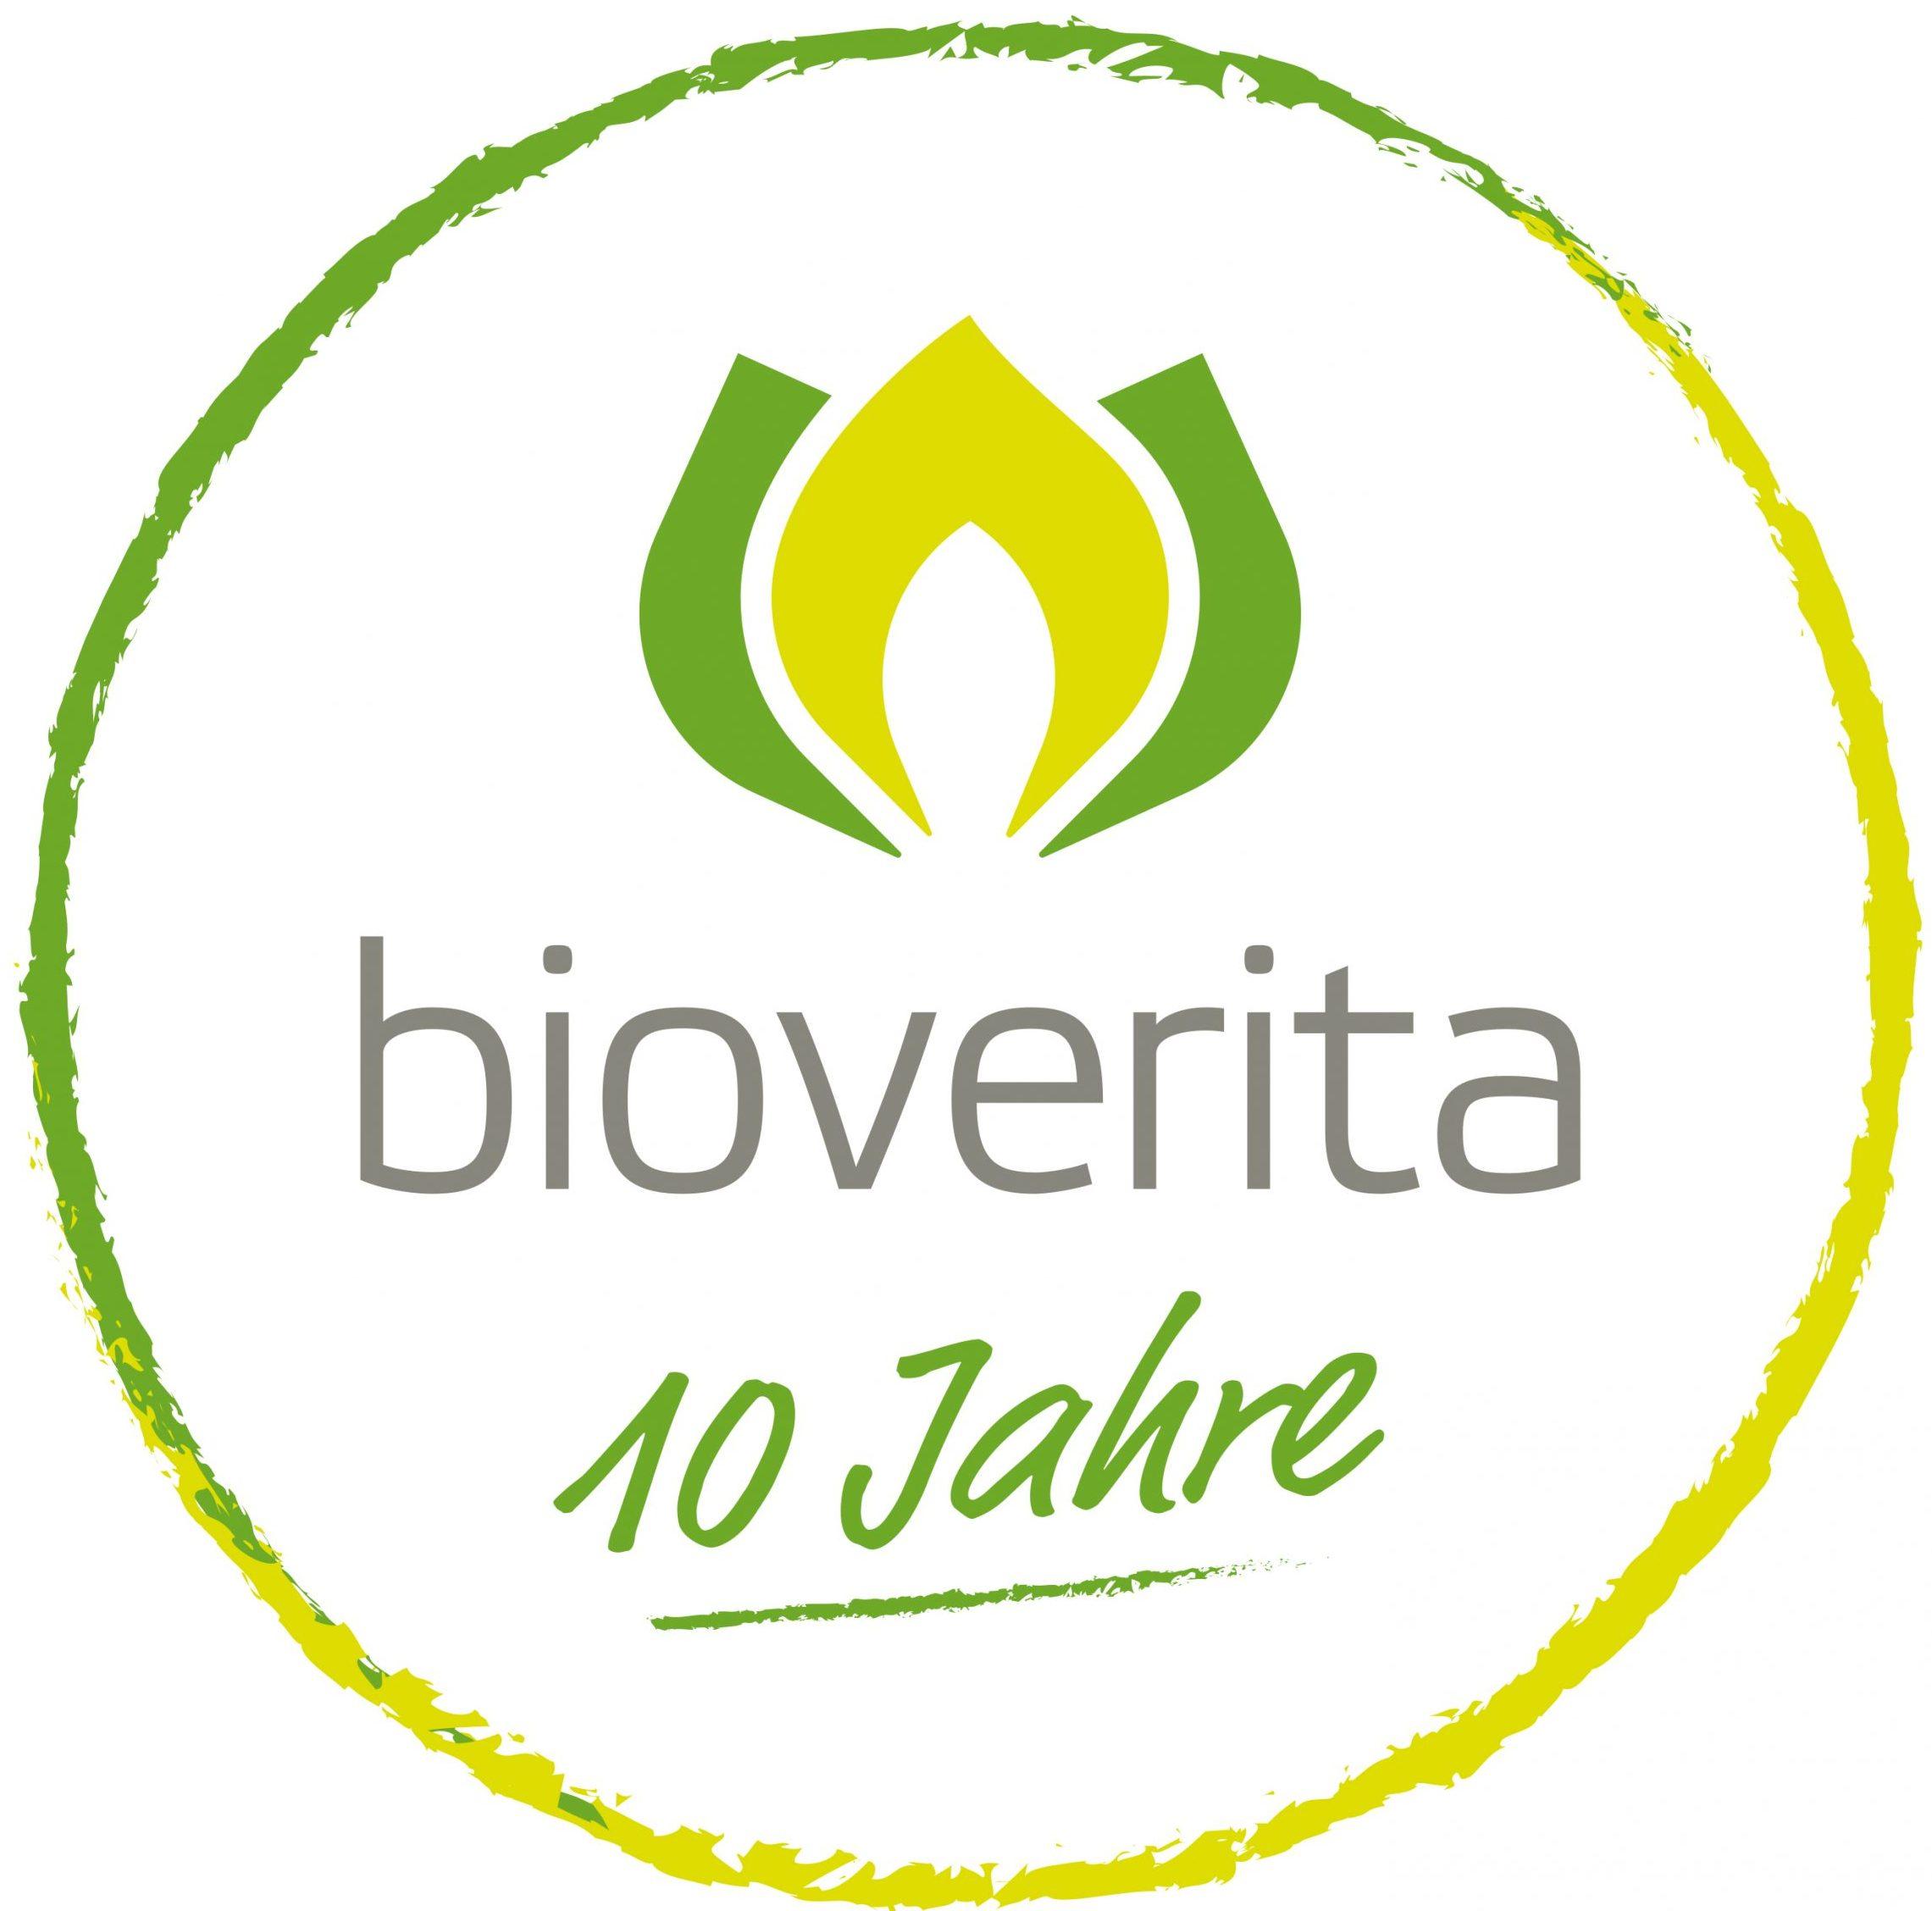 10 Jahre bioverita